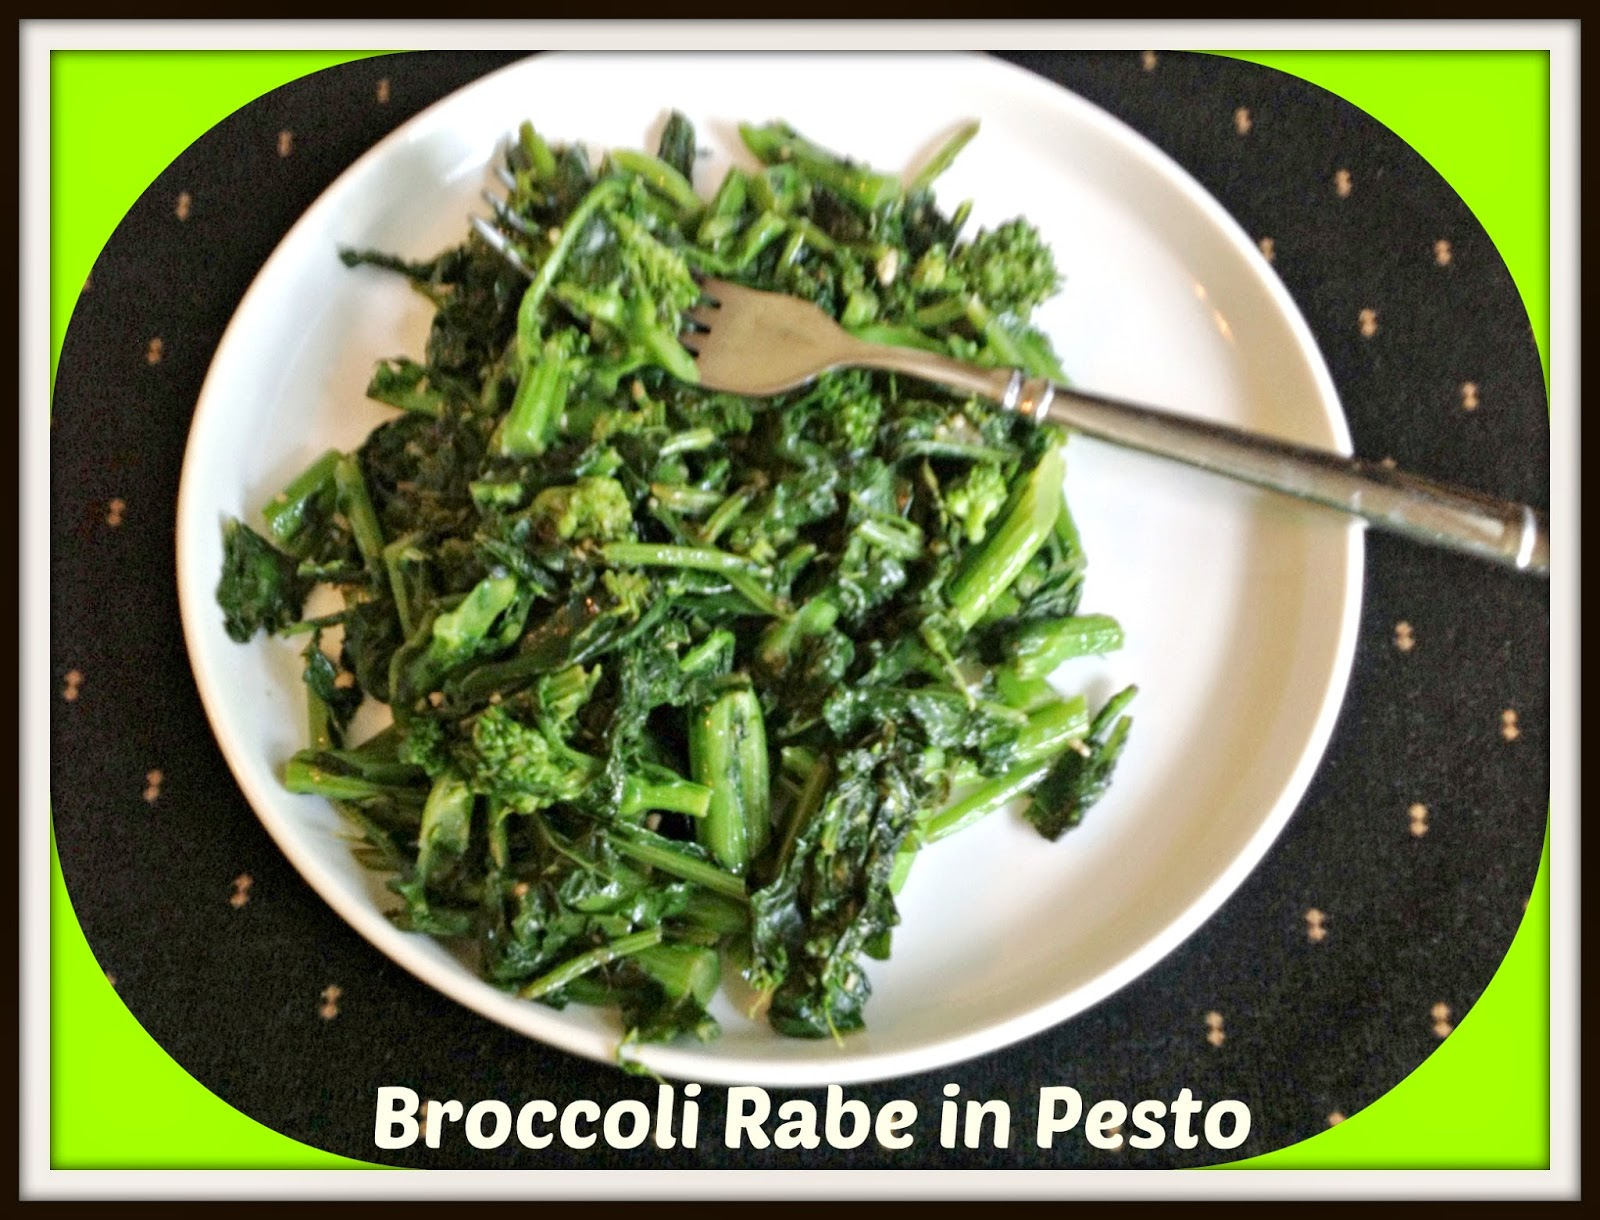 broccoli rabe tossed in pesto